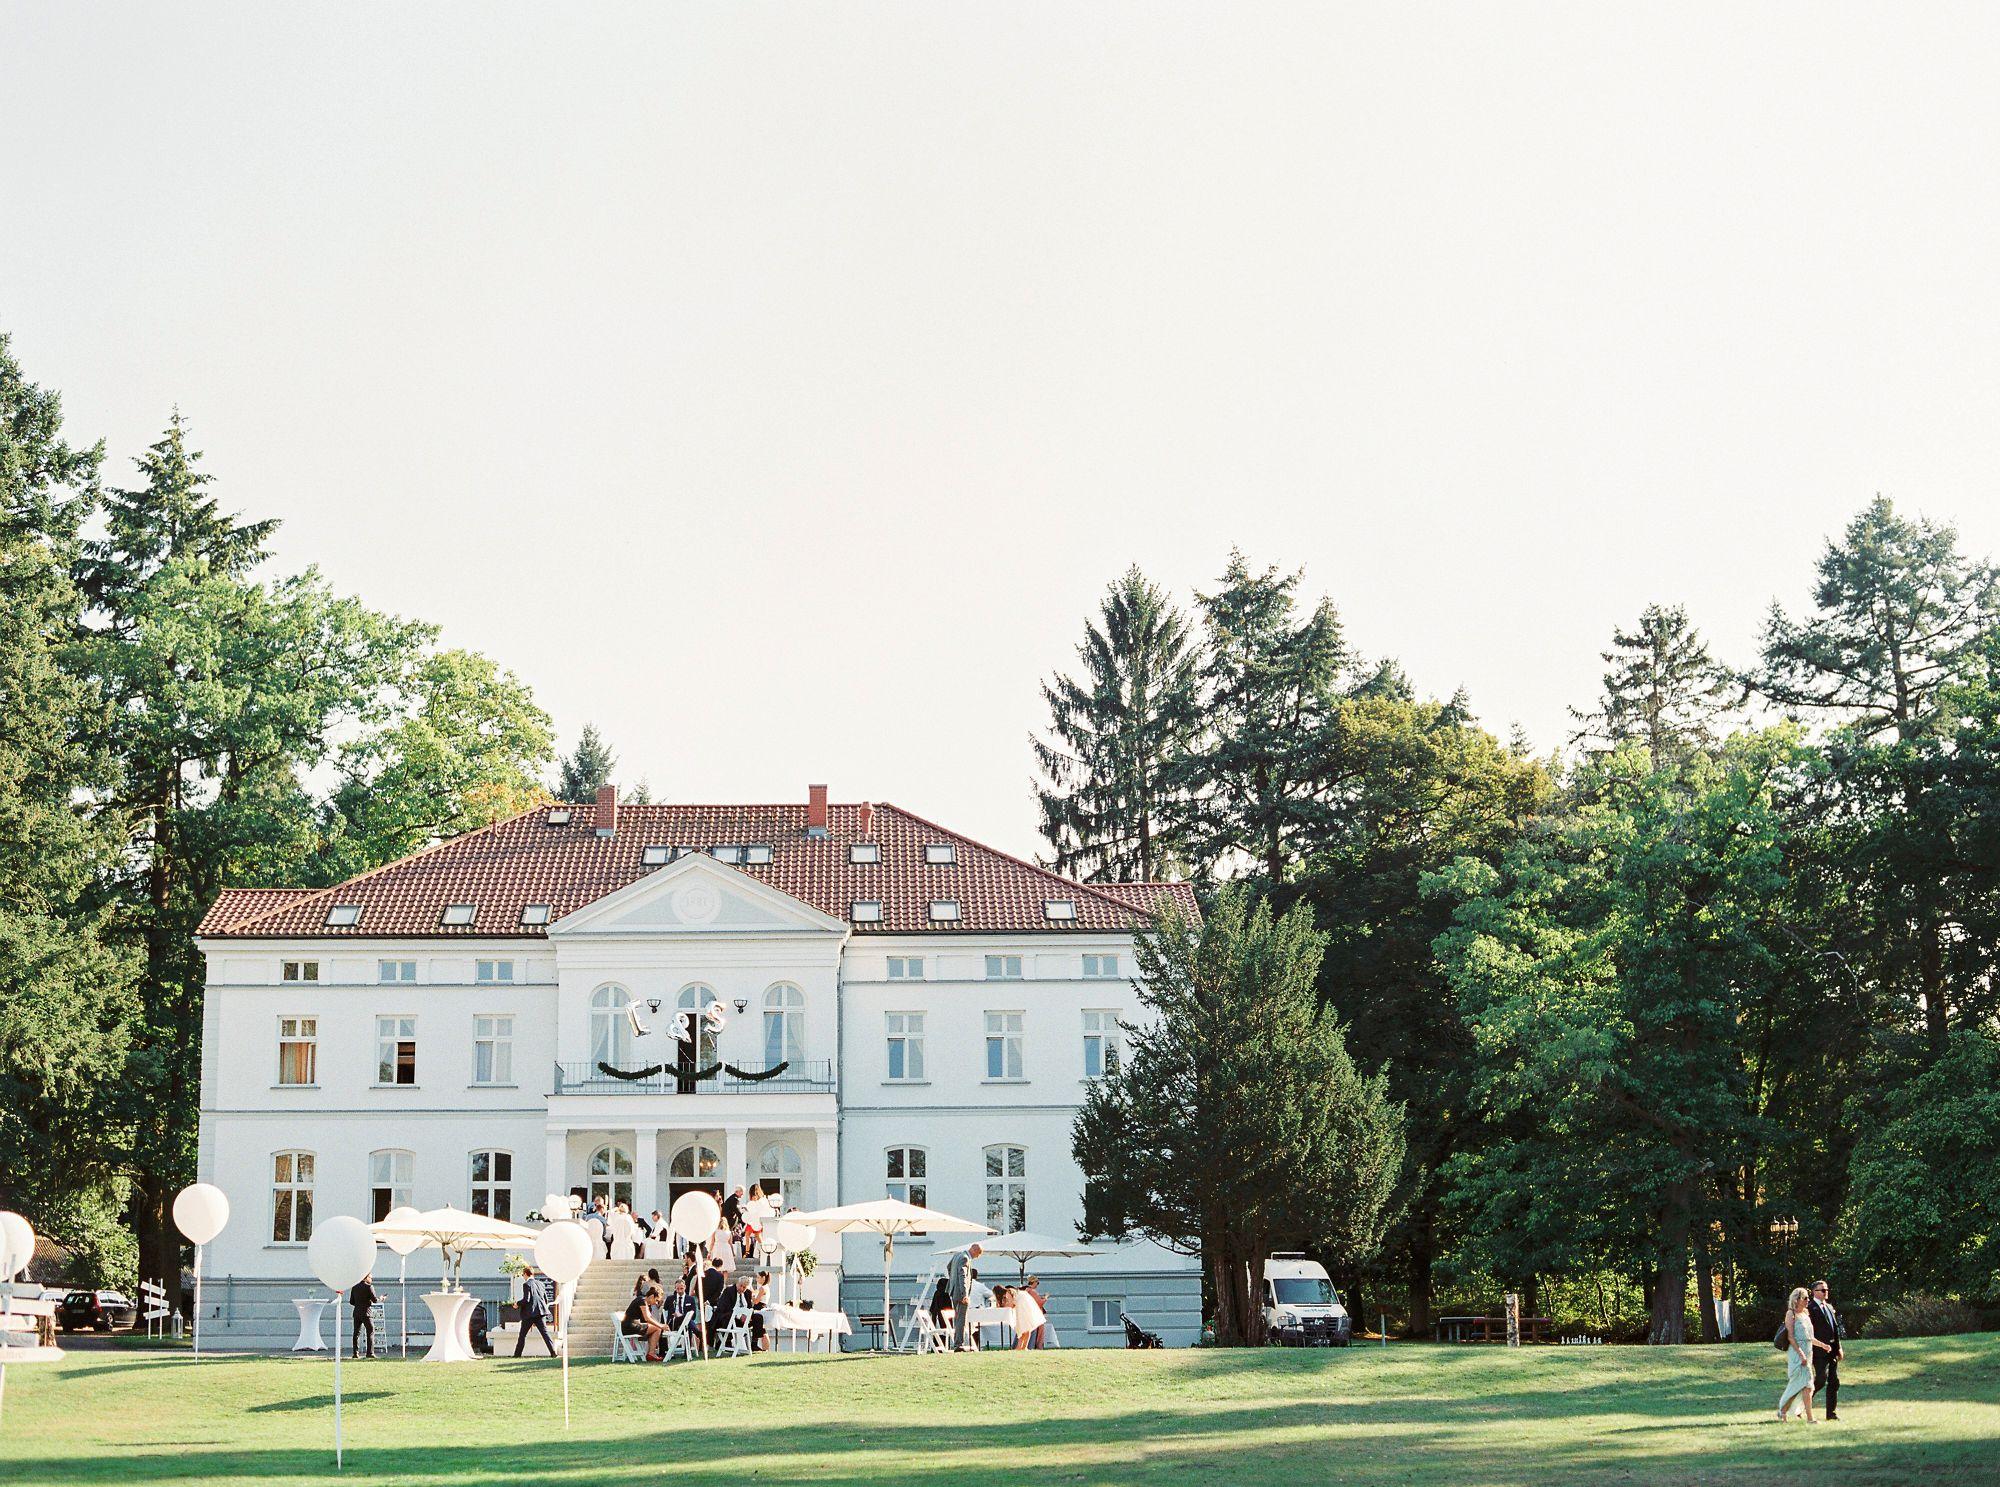 2000-katja-scherle-festtagsfotografien_berlin-hamburg-filmweddingphotographer-hochzeitsfotograf-rostock-mecklenburg_0032